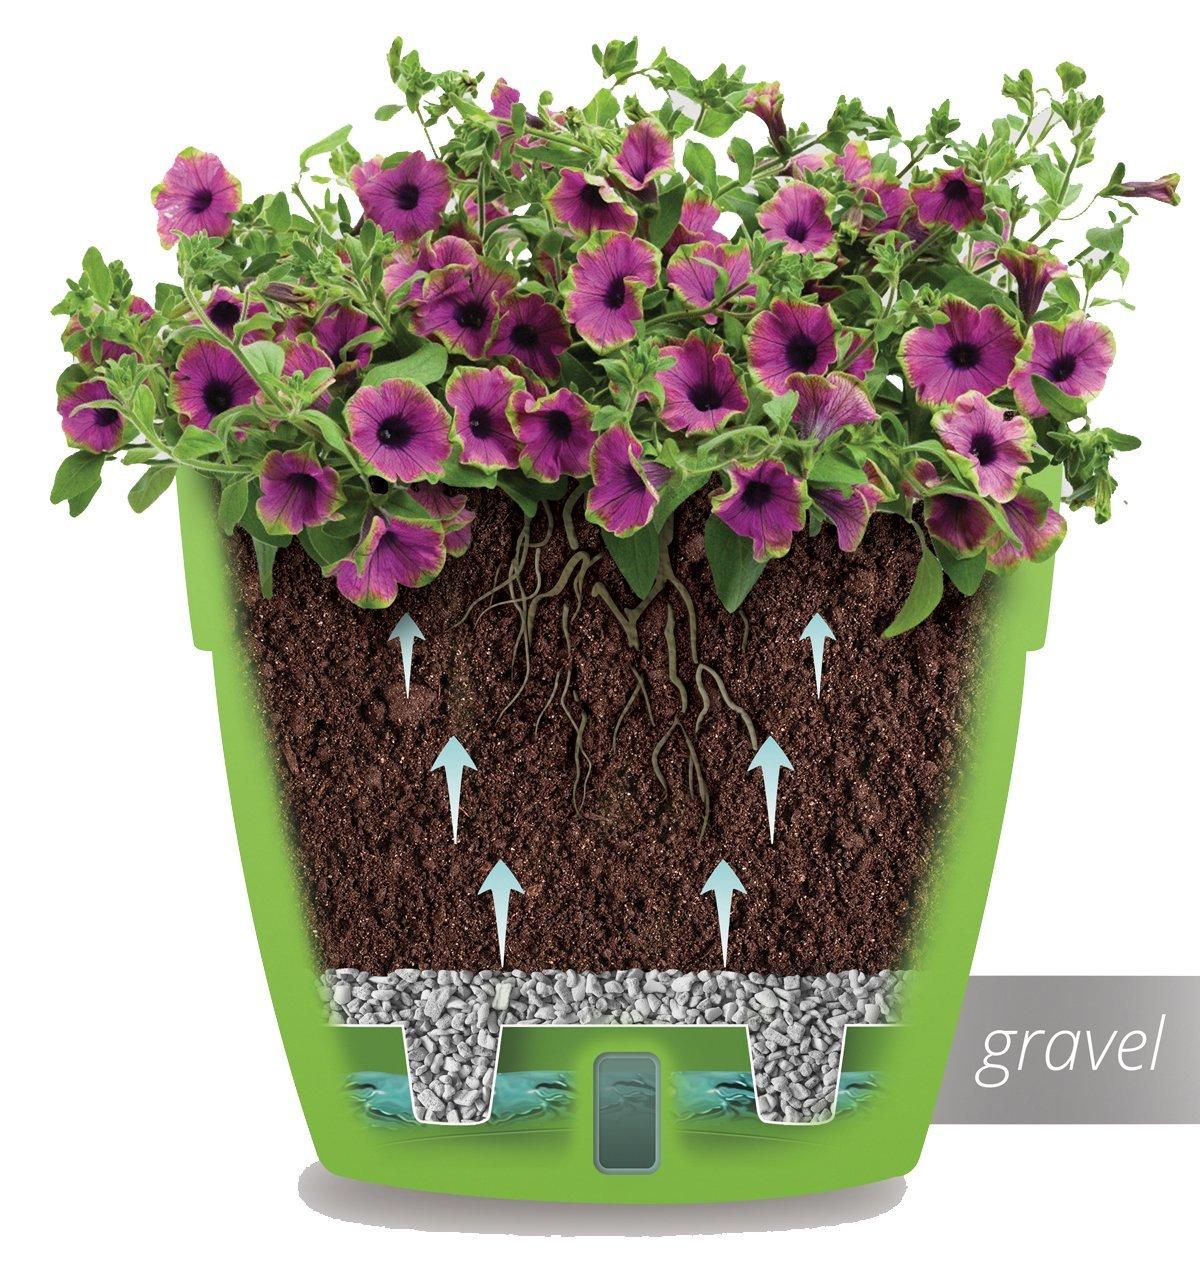 Amazon.com : Santino Self Watering Planter Asti 7.1 Inch White/Black Flower  Pot : Garden & Outdoor